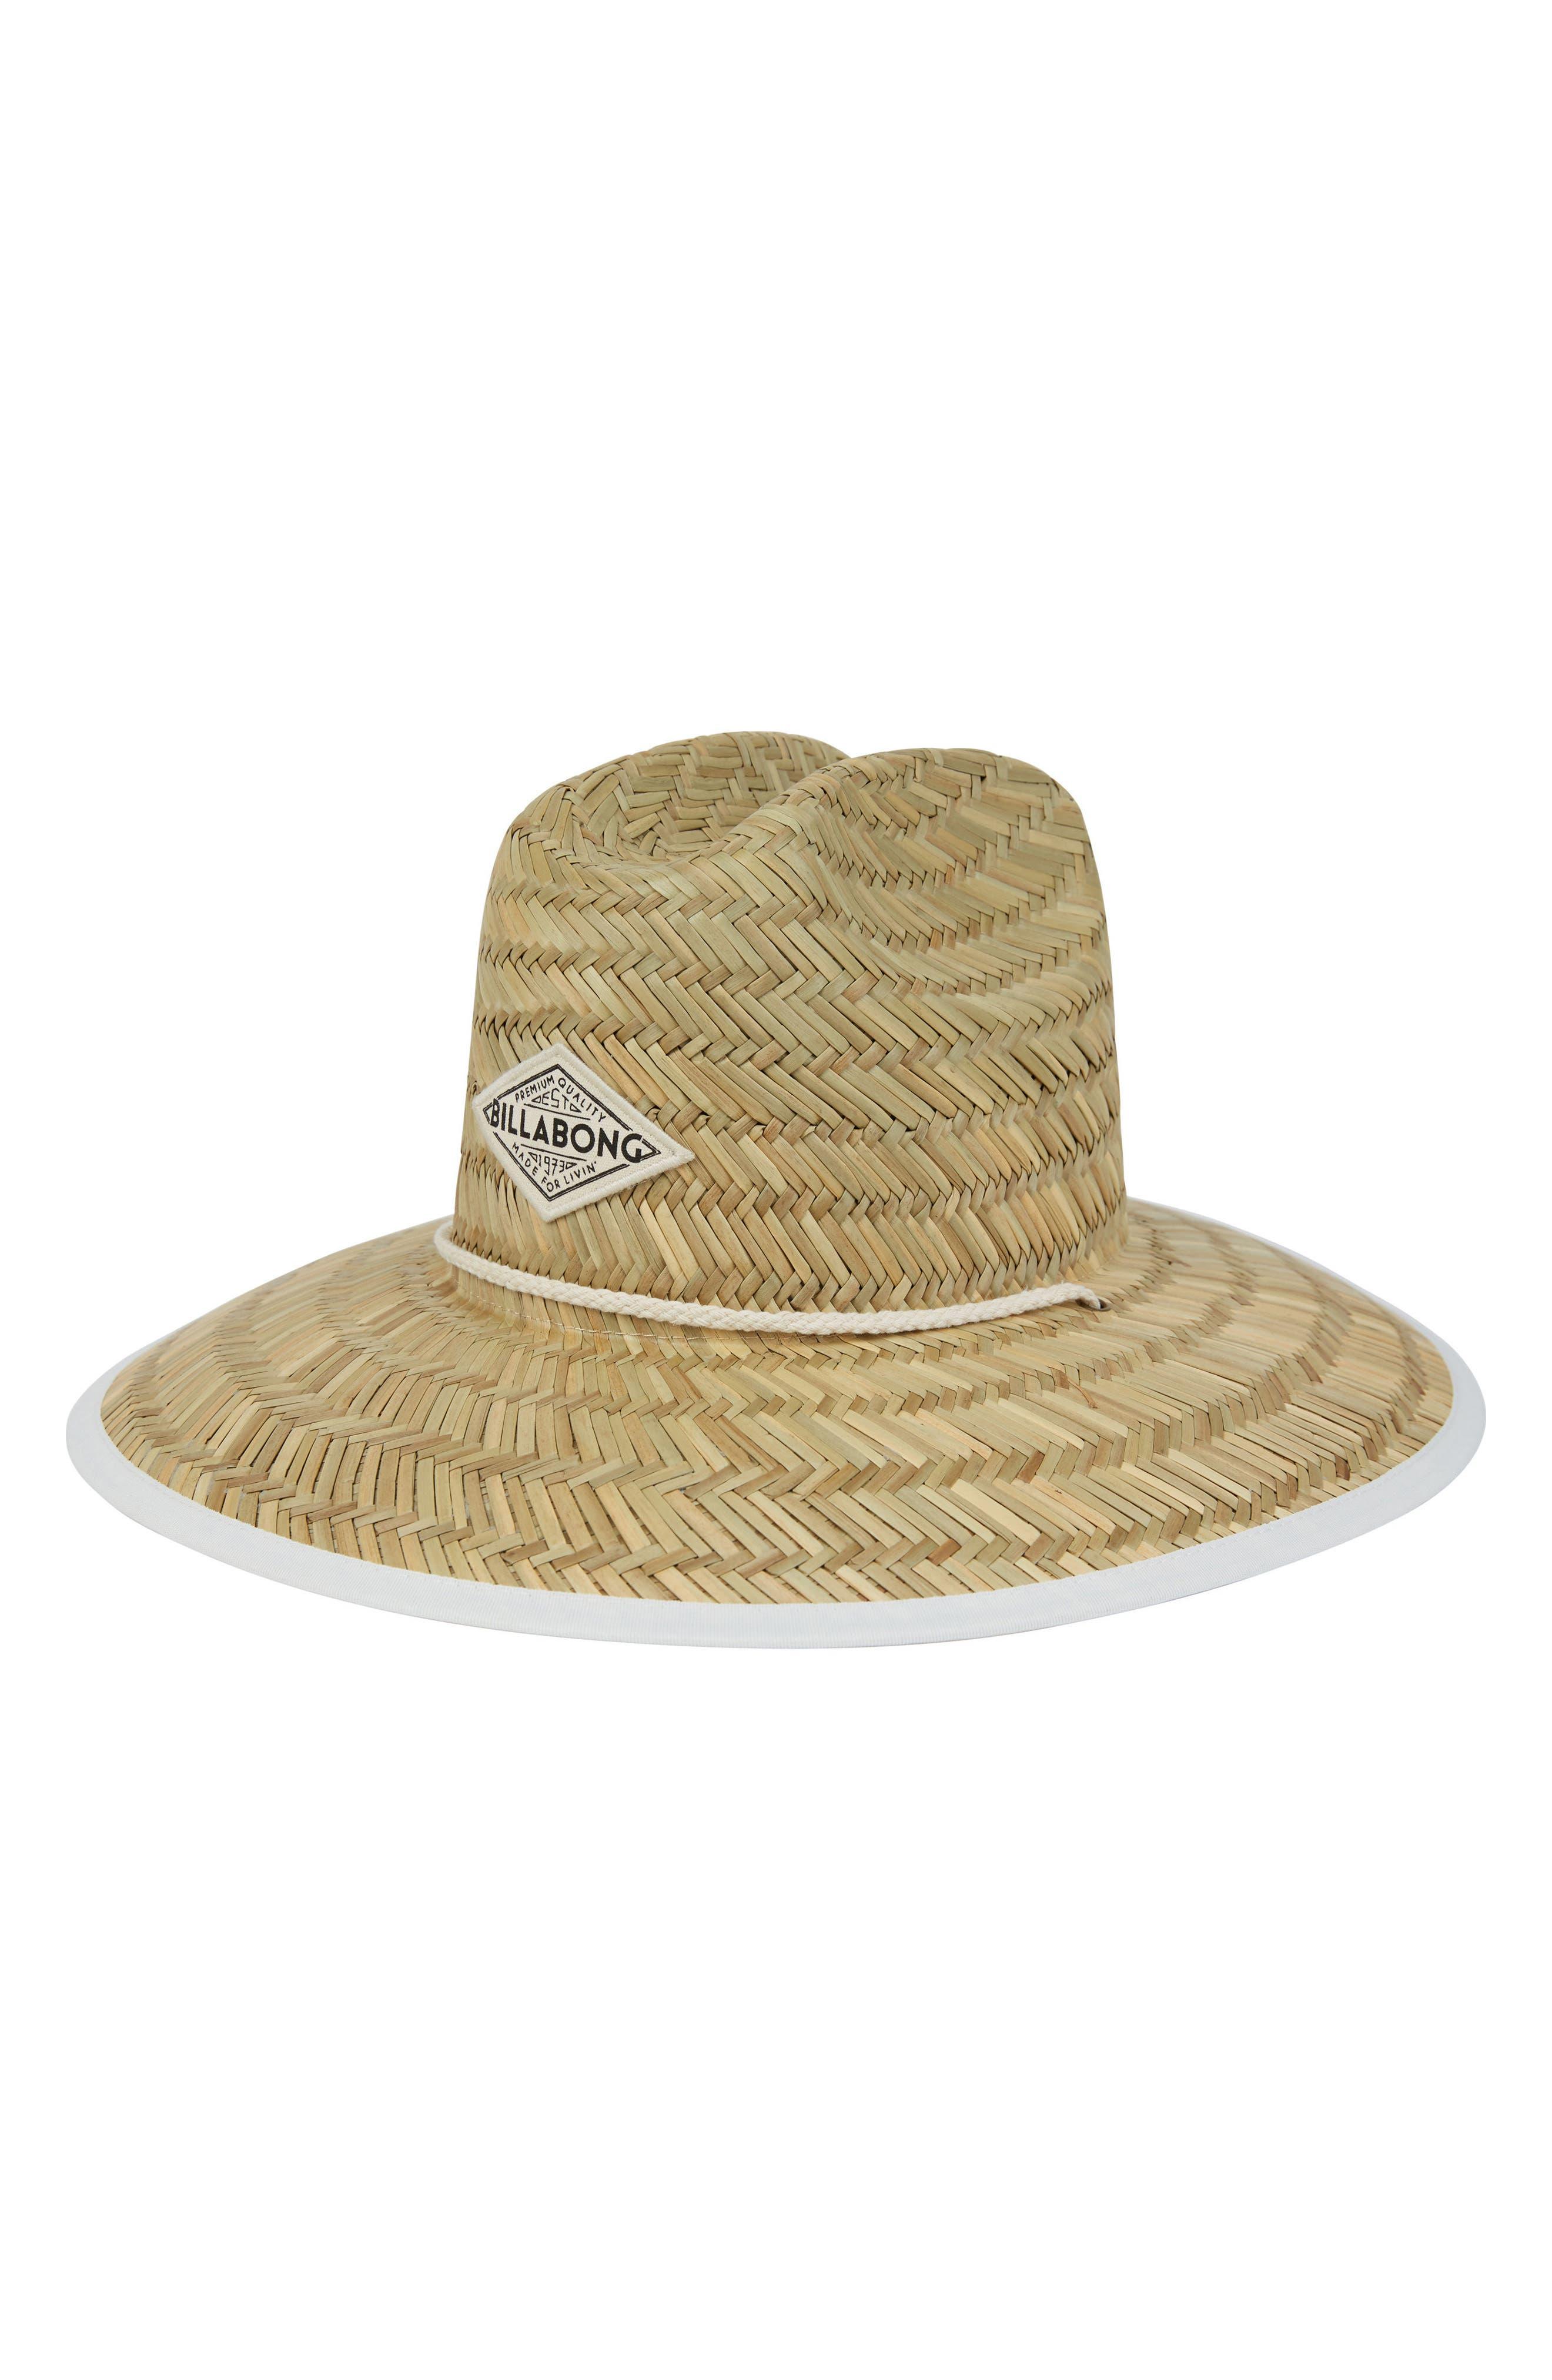 Tipton Straw Hat,                         Main,                         color, 250